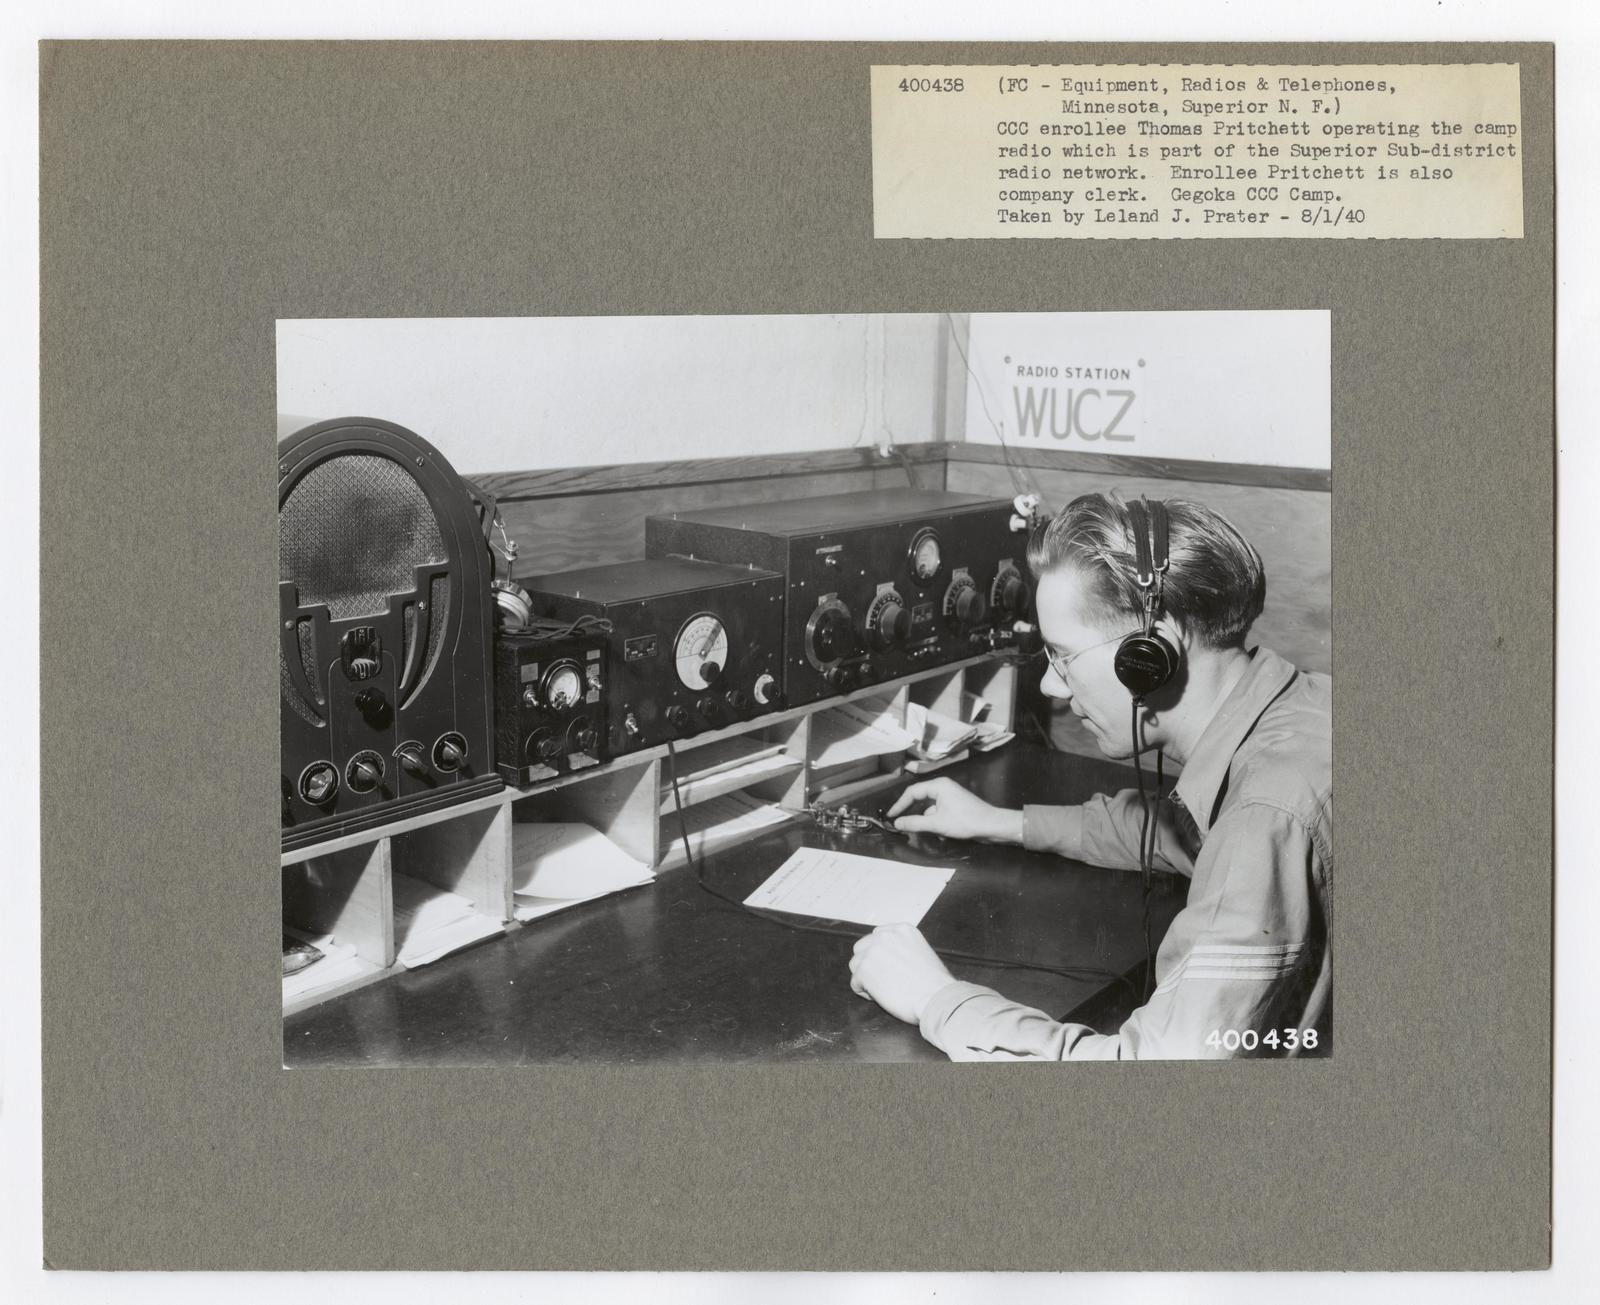 Communications: Radios - Minnesota